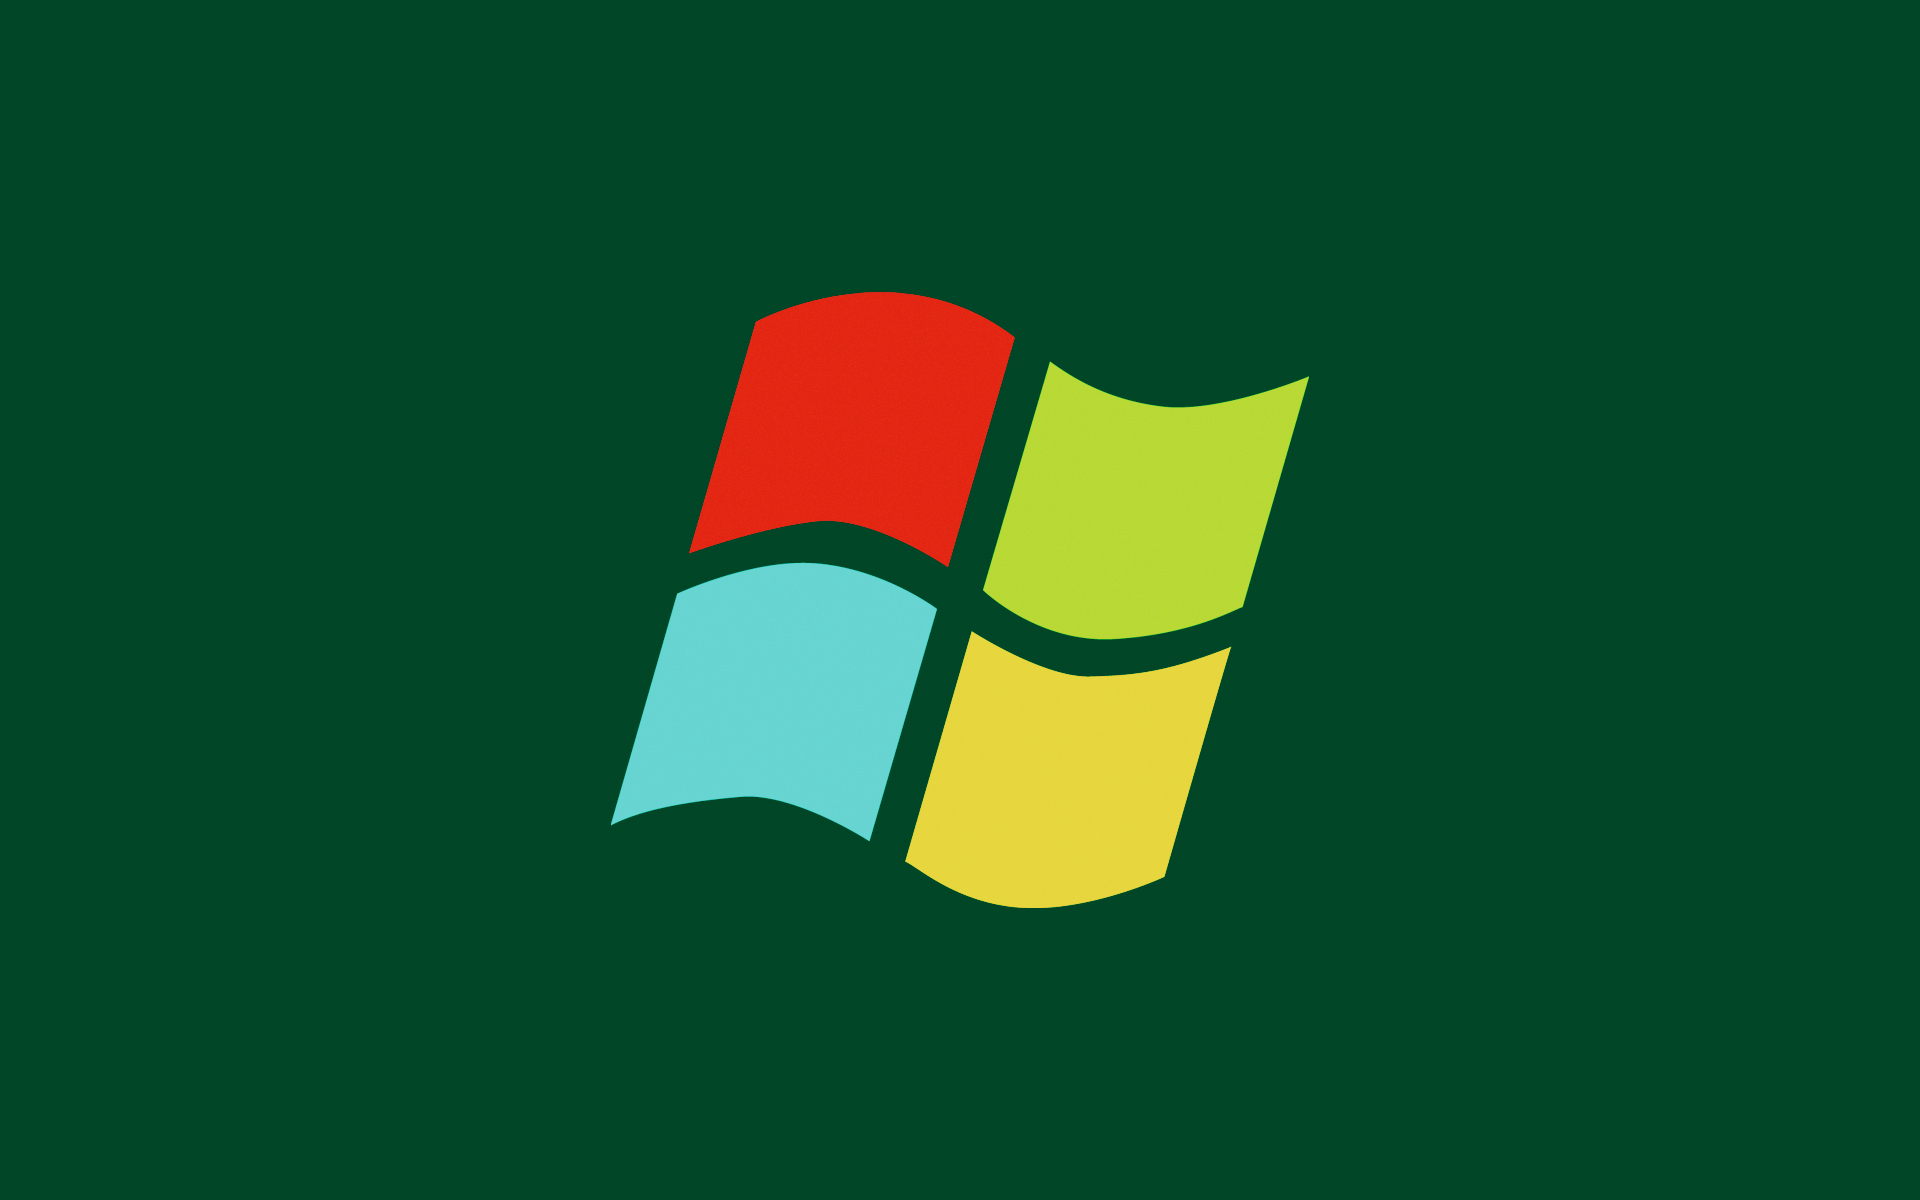 1920x1200 Windows 8 Logo desktop PC and Mac wallpaper 1920x1200